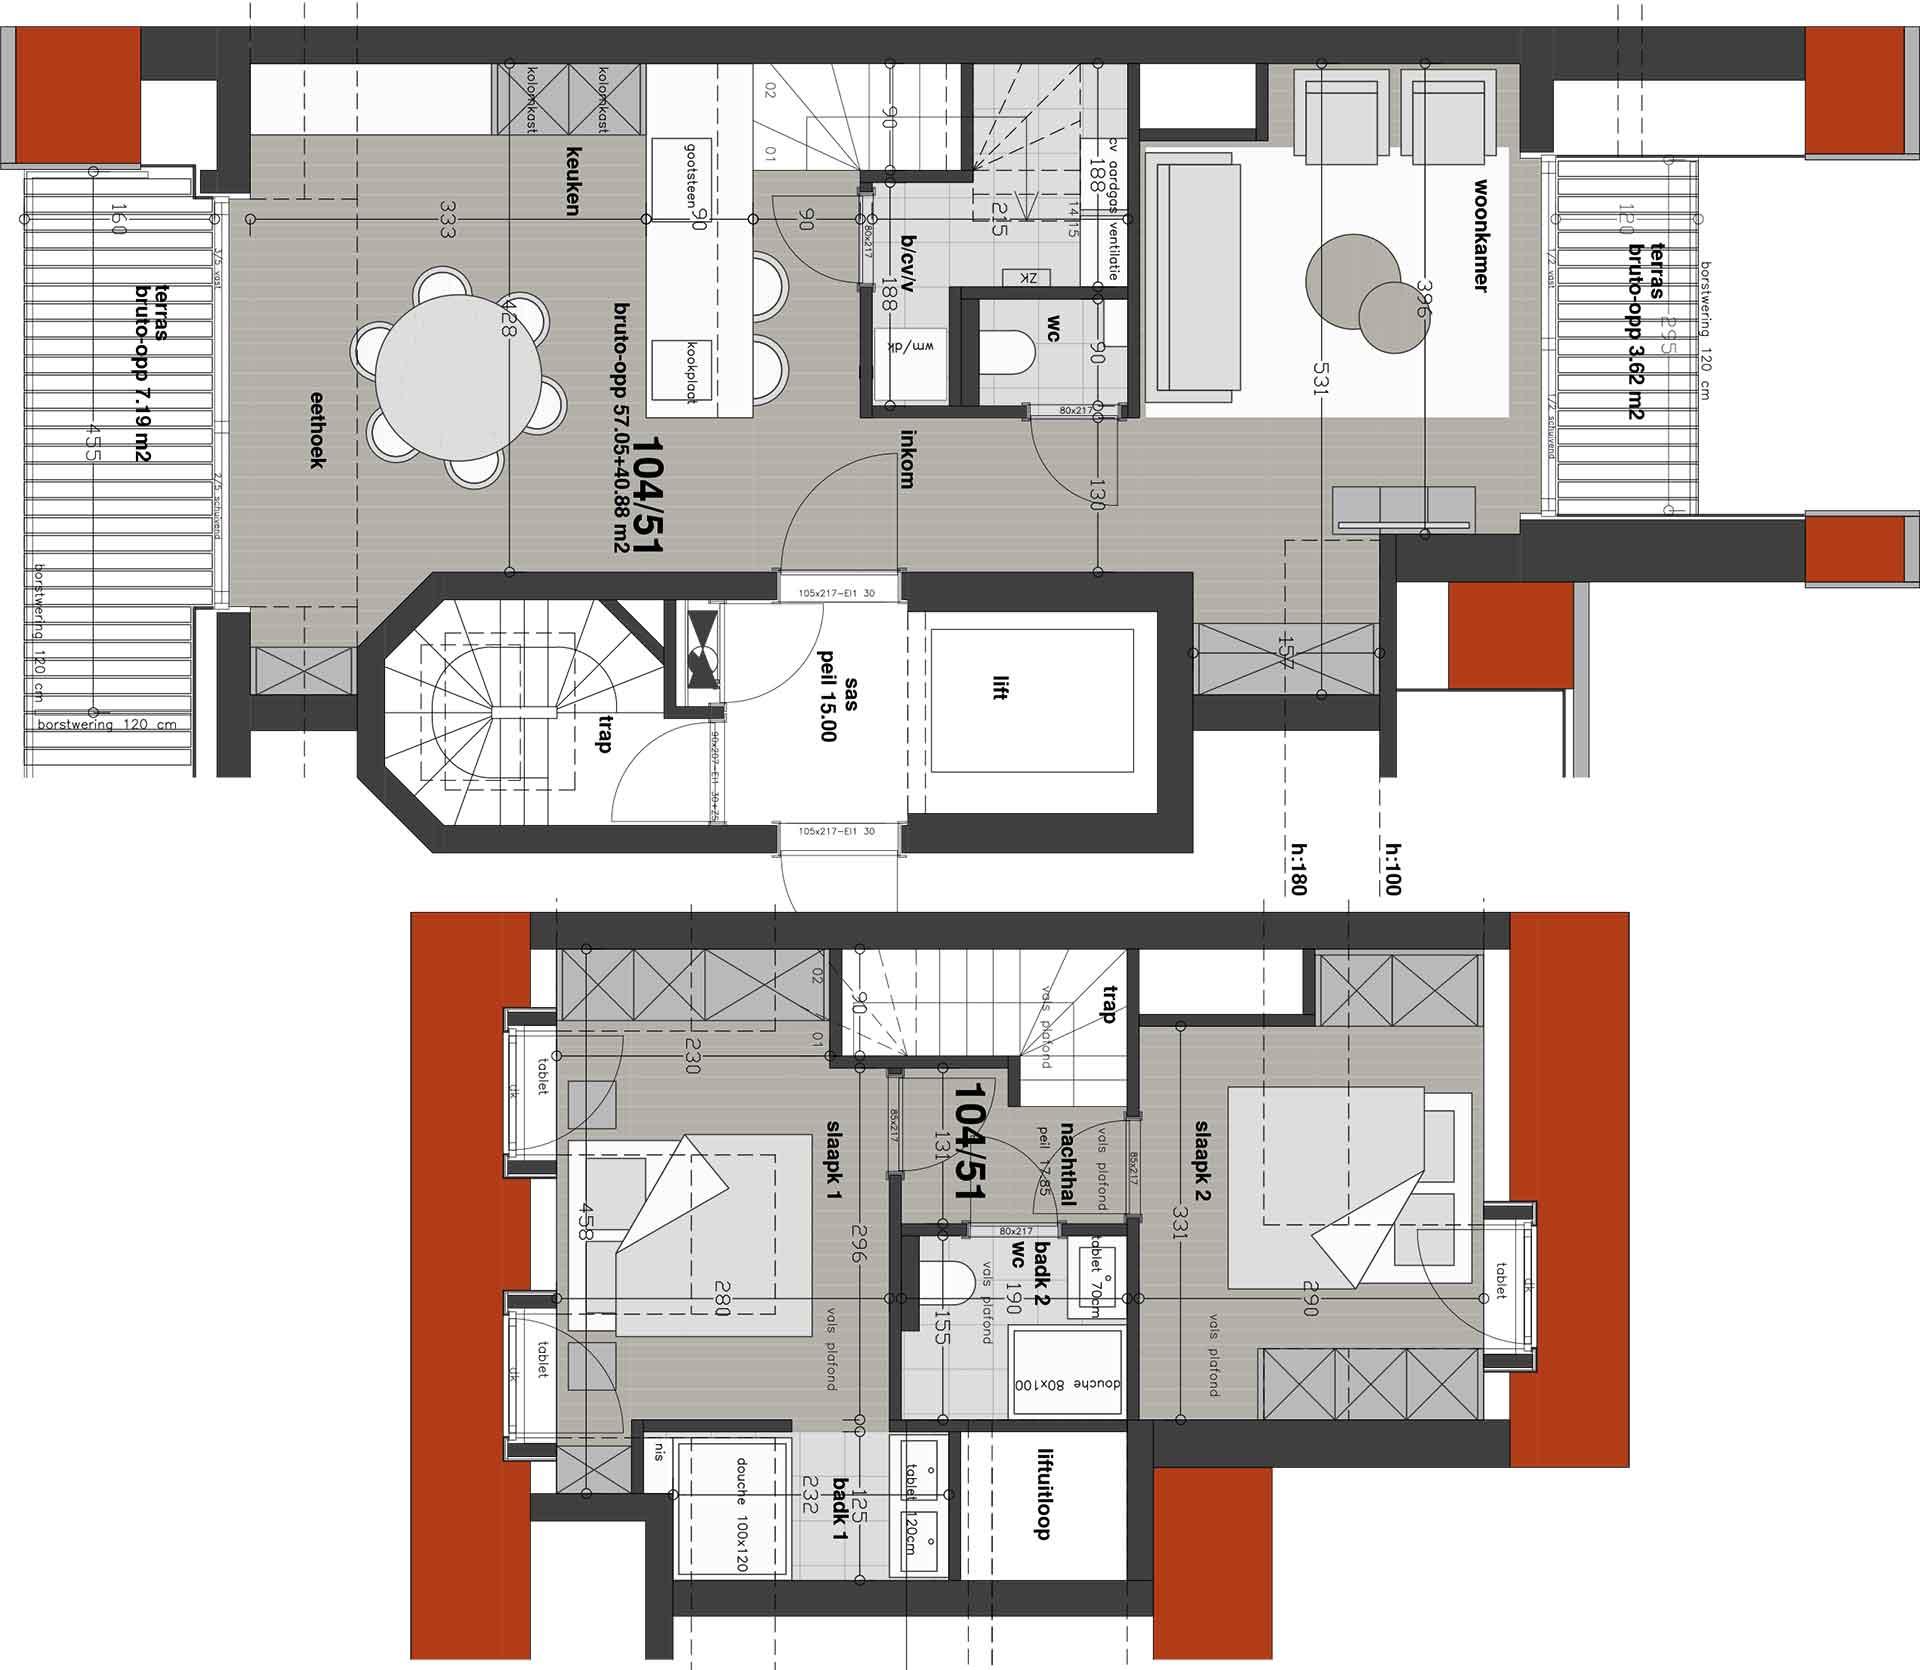 Residentie <br/> Chagall - image appartement-te-koop-knokke-heist-residentie-chagall-plan-51 on https://hoprom.be